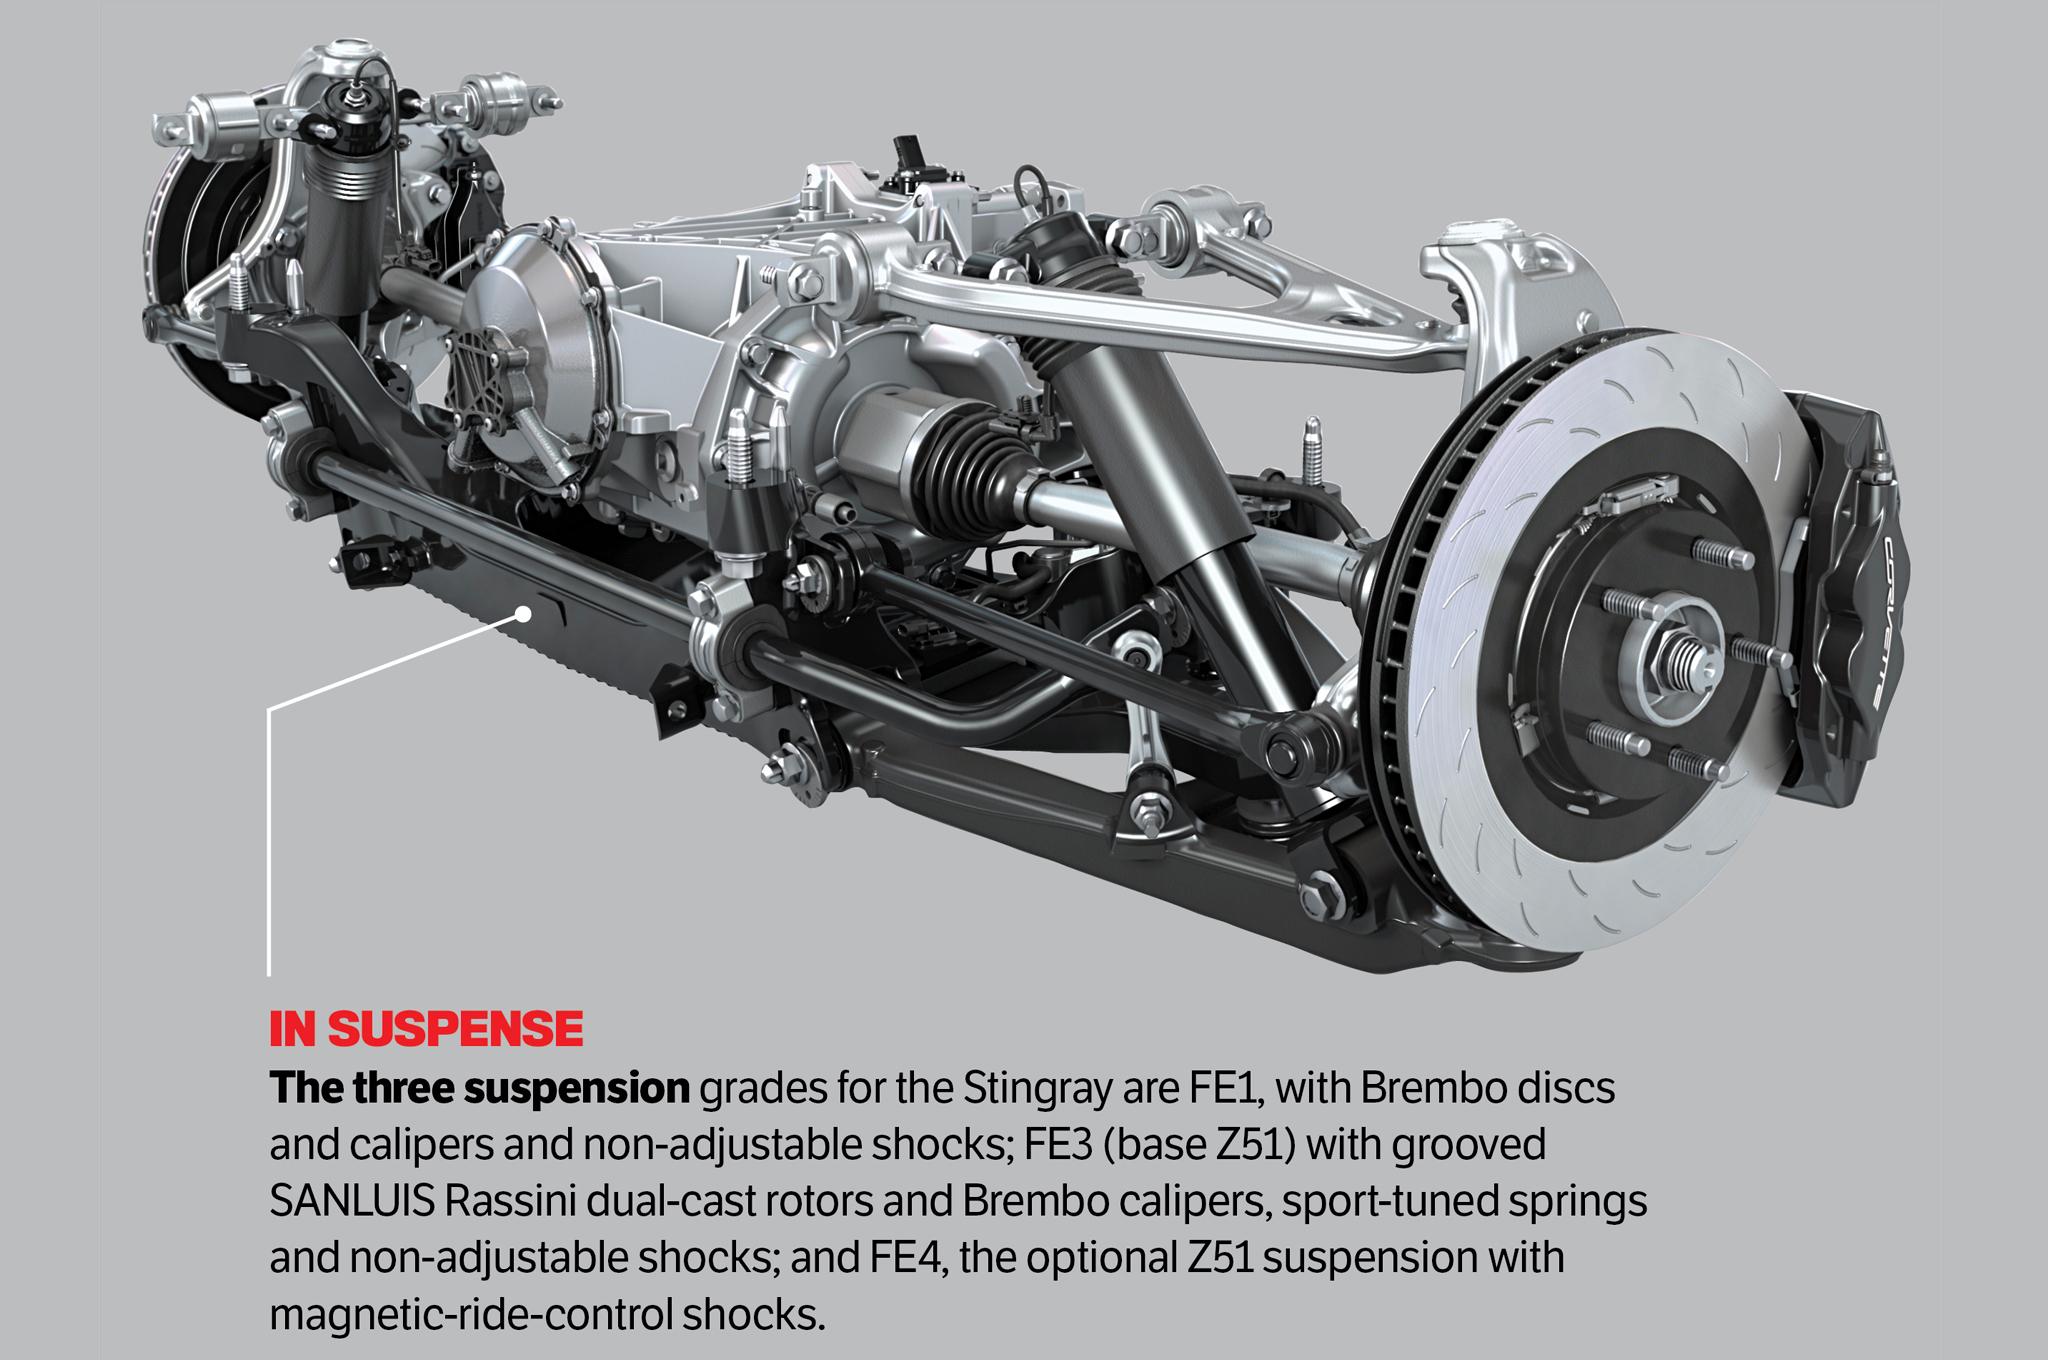 C7 Corvette Rear Suspension Diagram. Corvette. Auto Parts